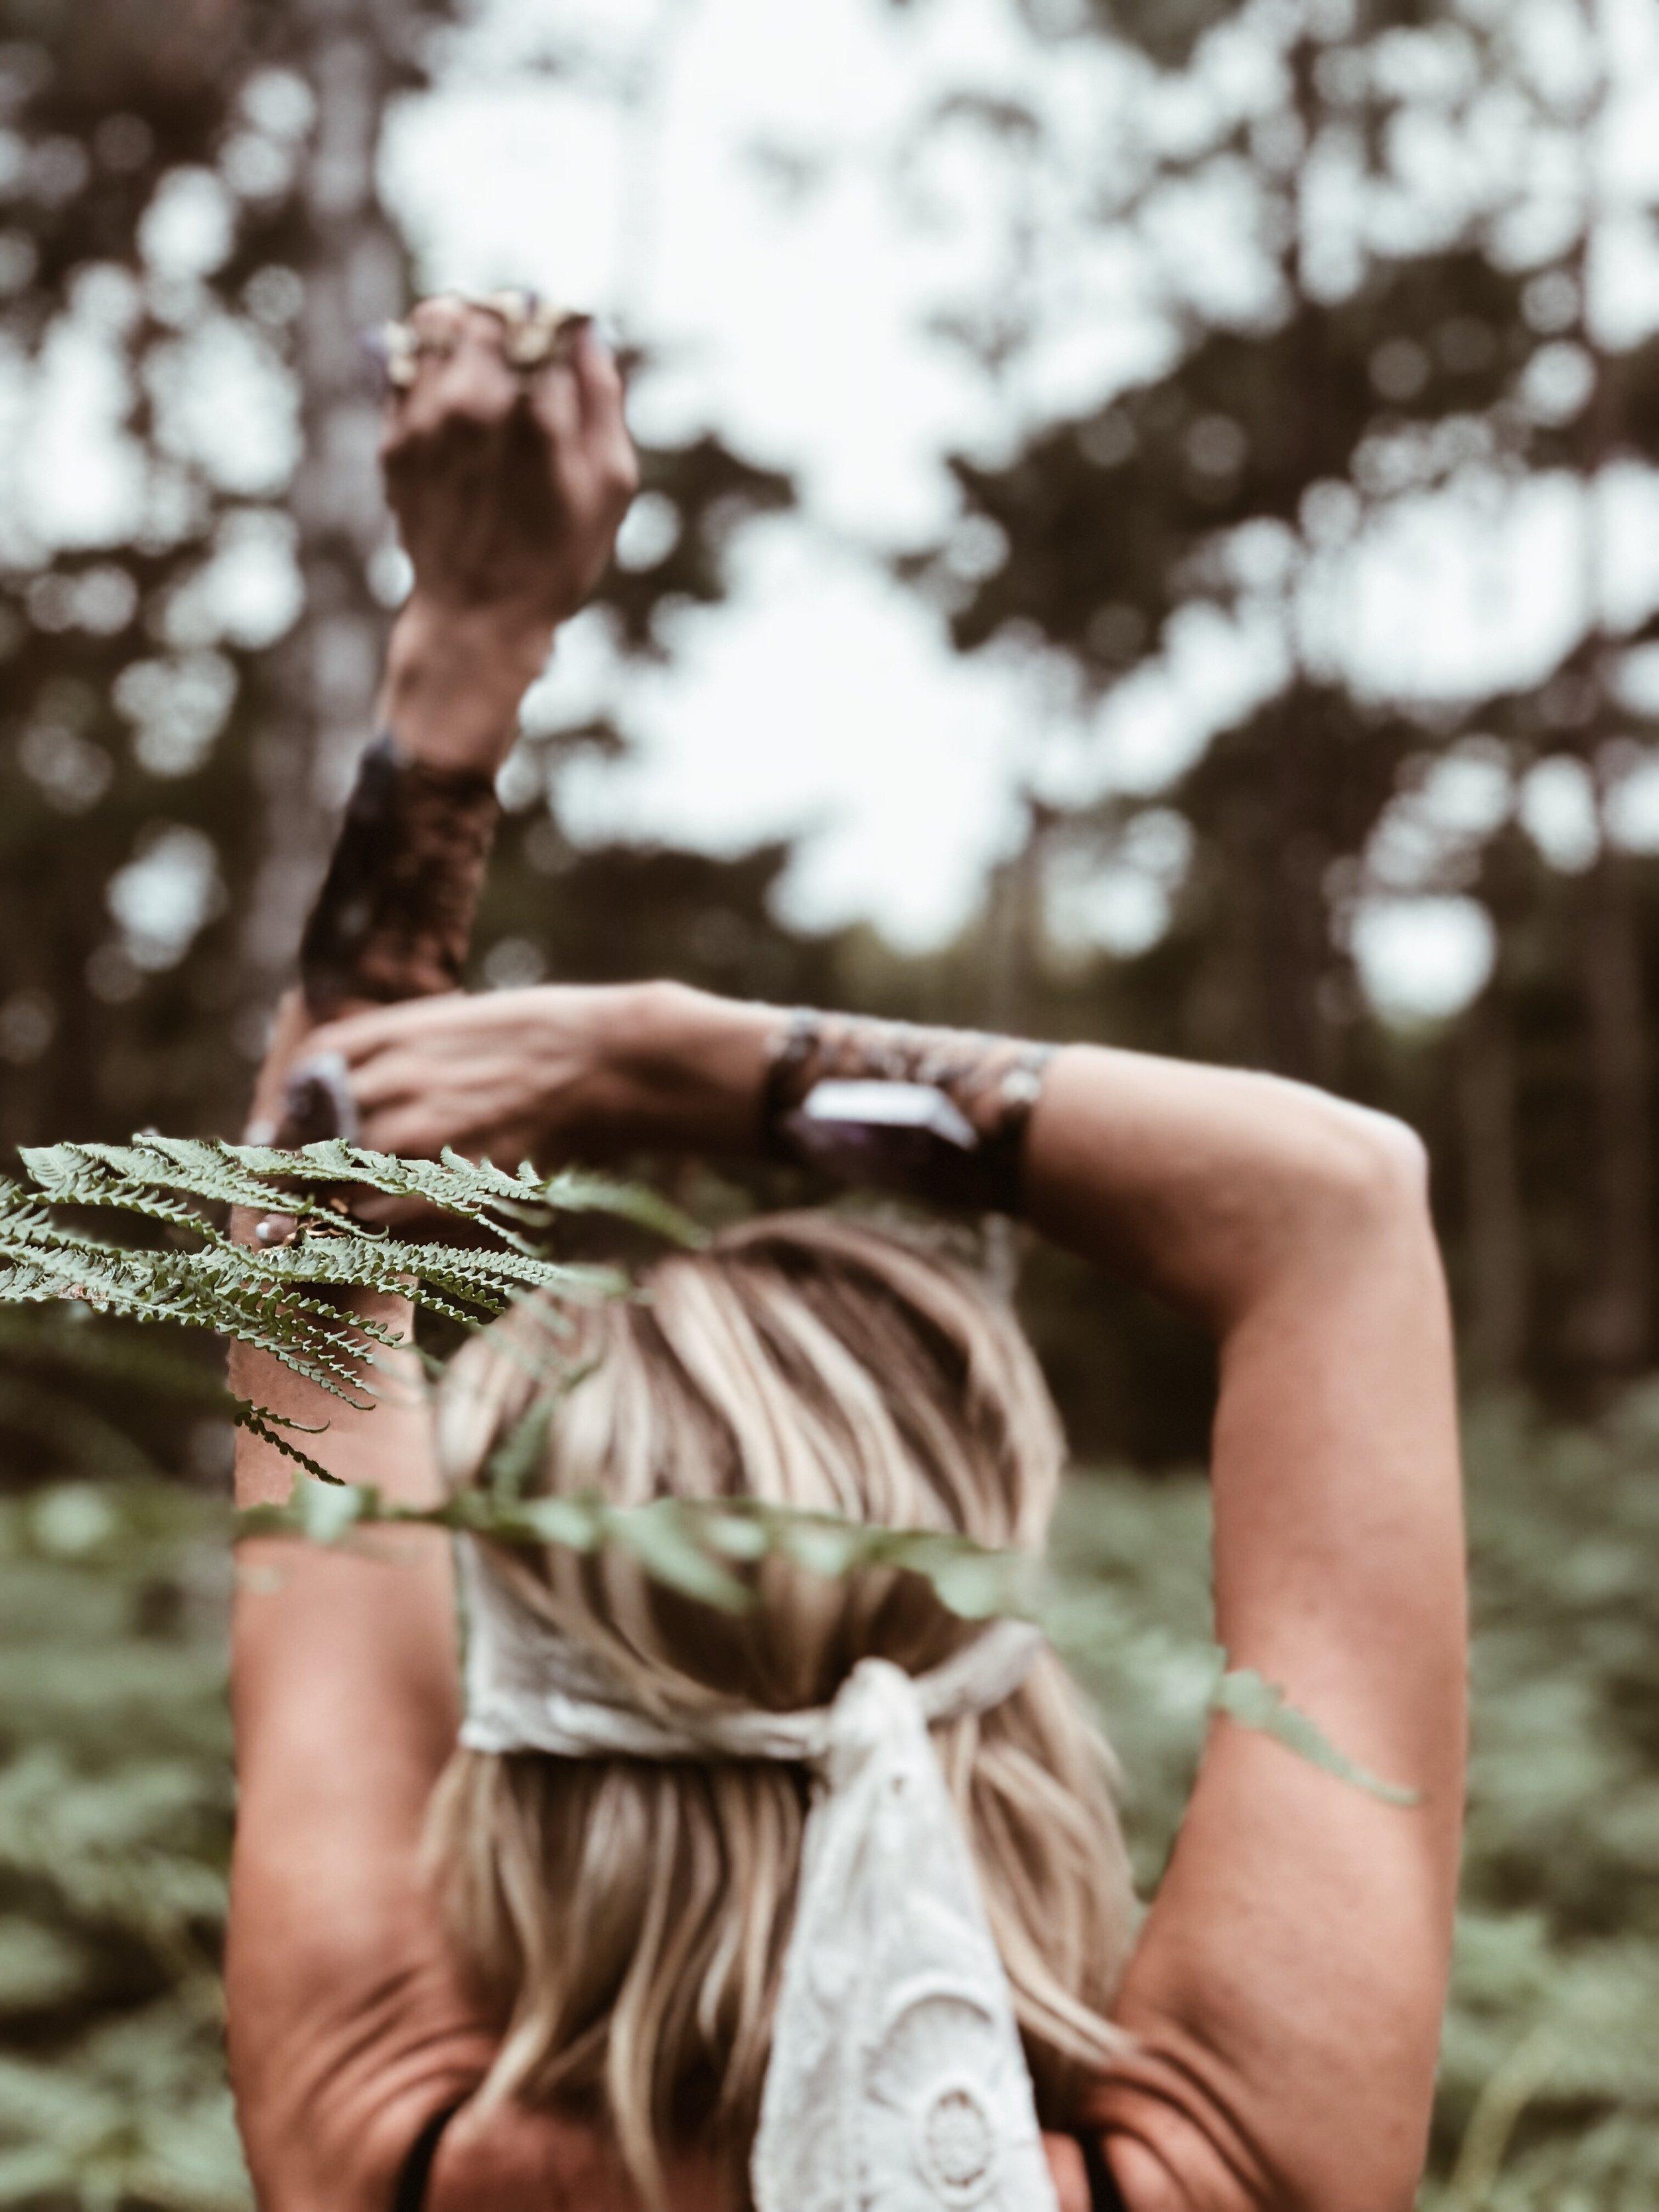 Carnet Sauvage - blog mode femme lille -visual story teller - wild christina rose14.jpg